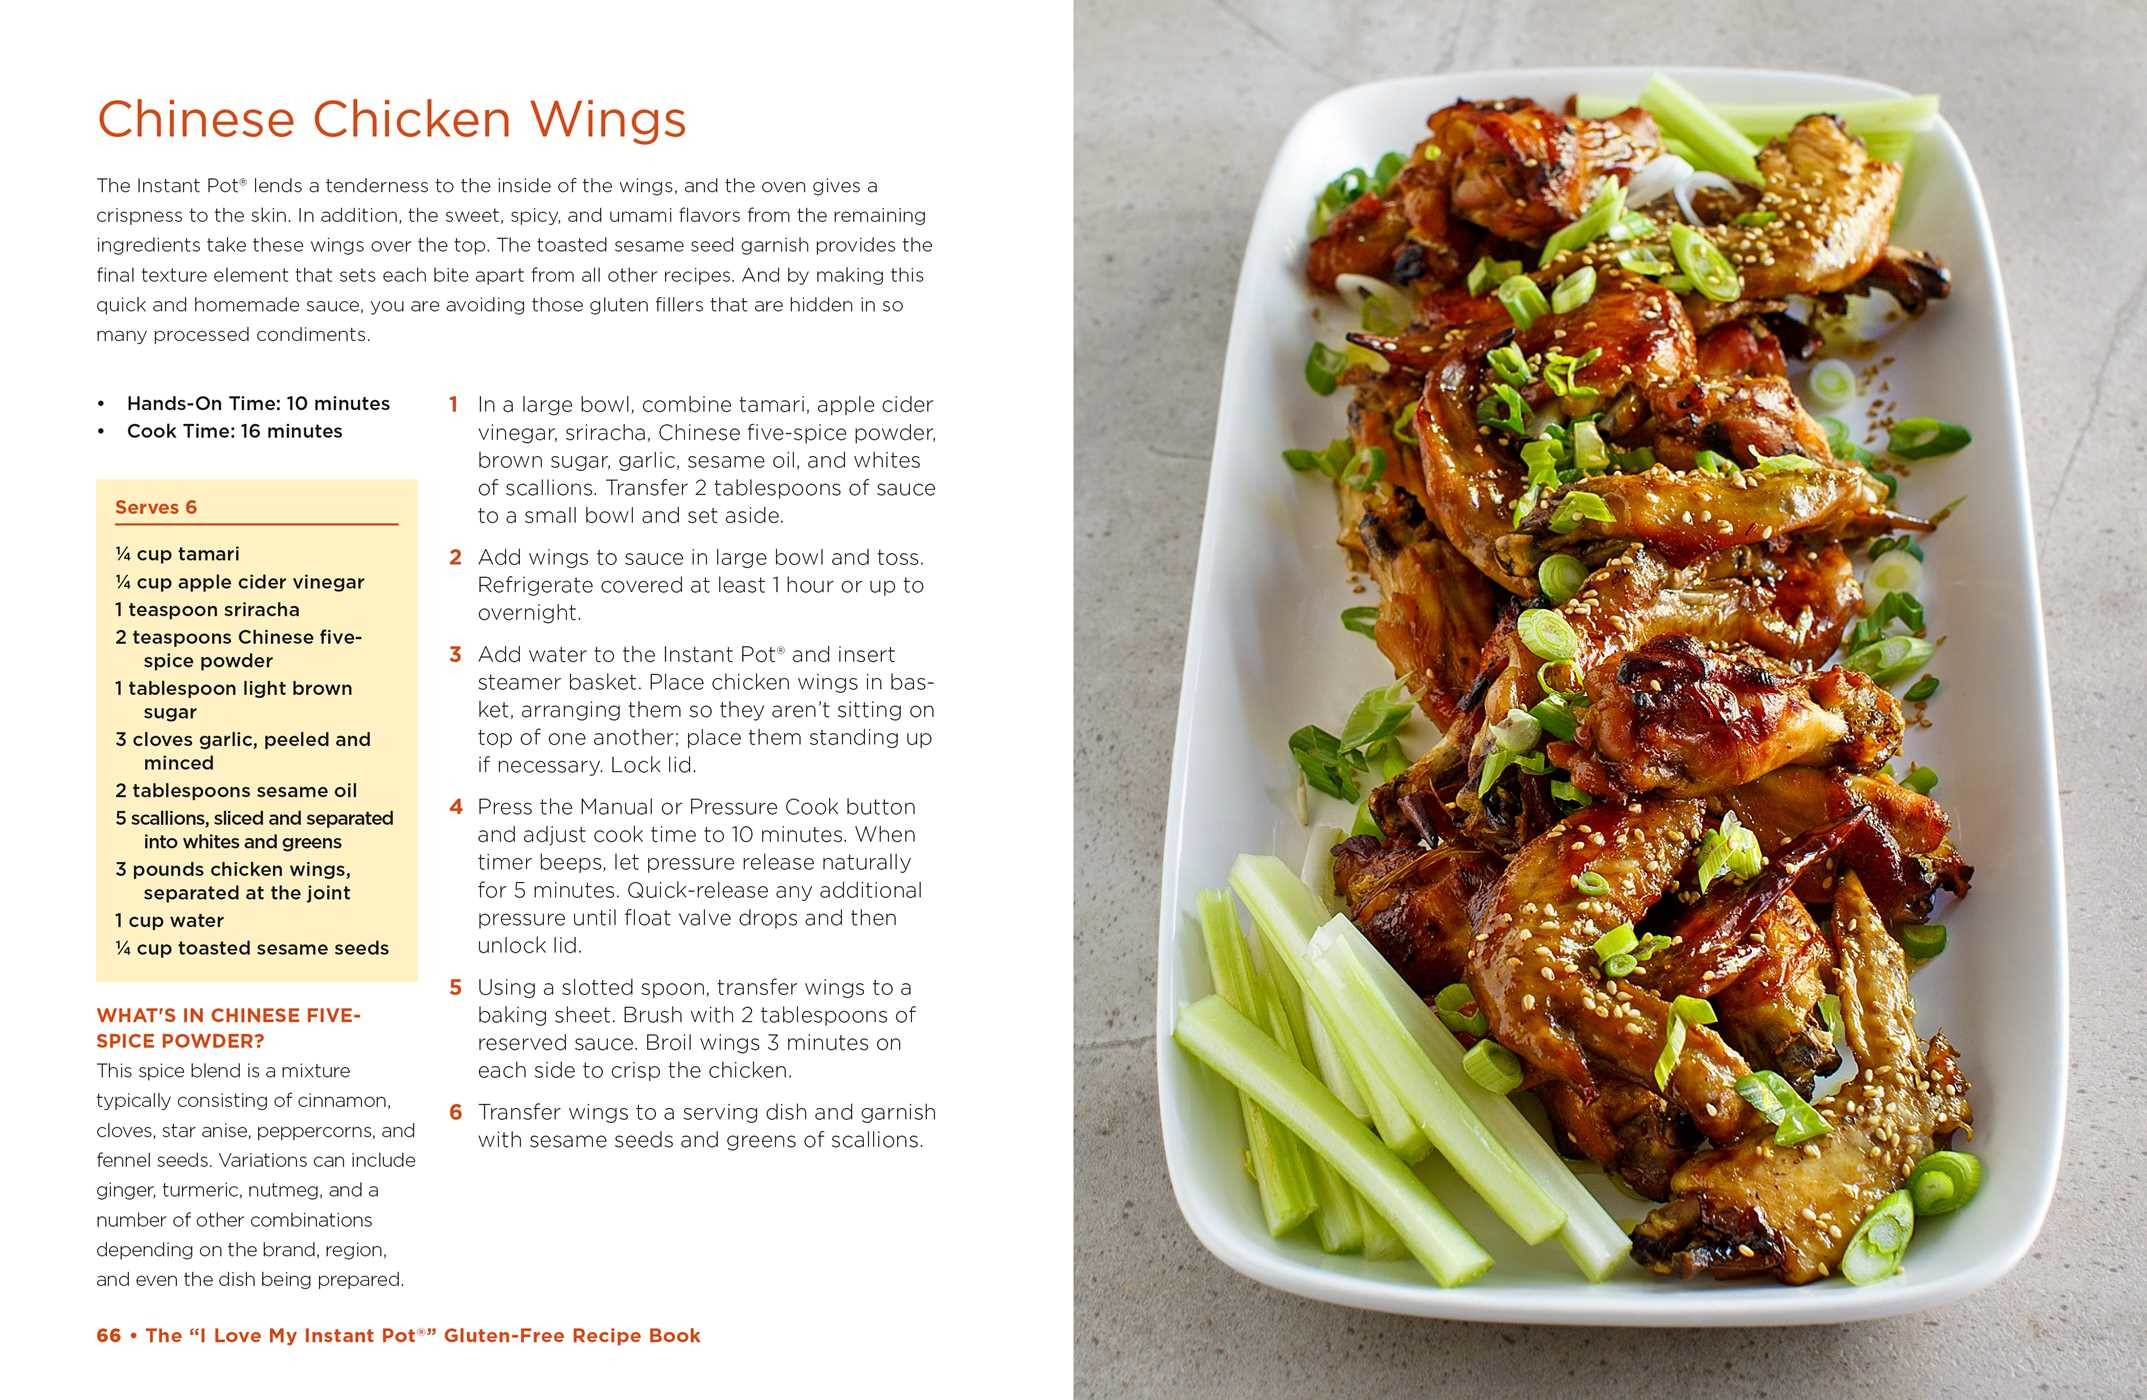 The i love my instant pot gluten free recipe book 9781507208717.in02